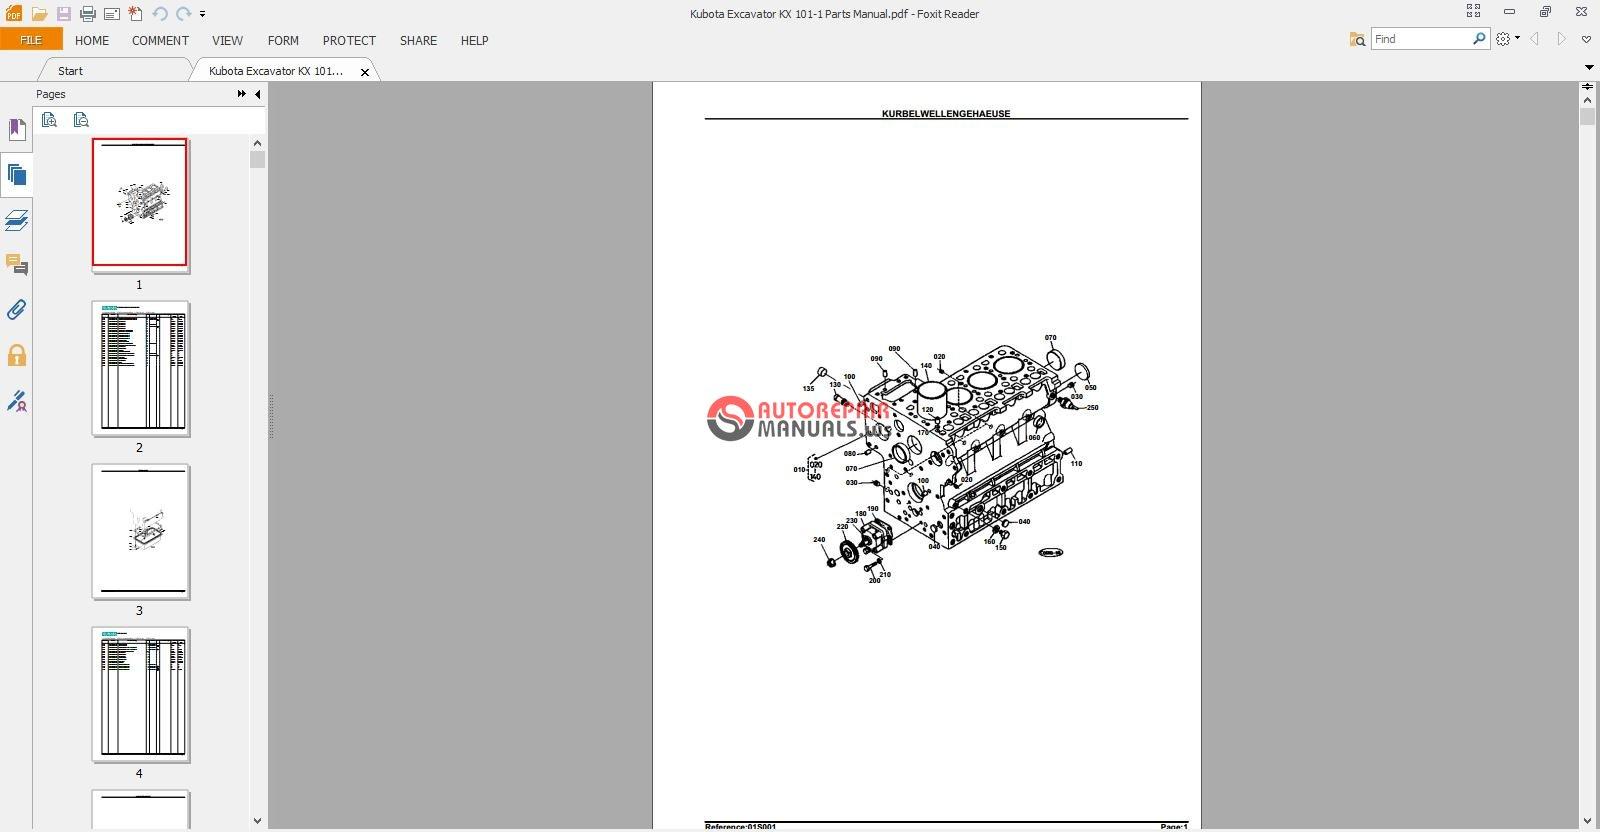 Kubota Excavator KX 101-1 Parts Manual.jpg